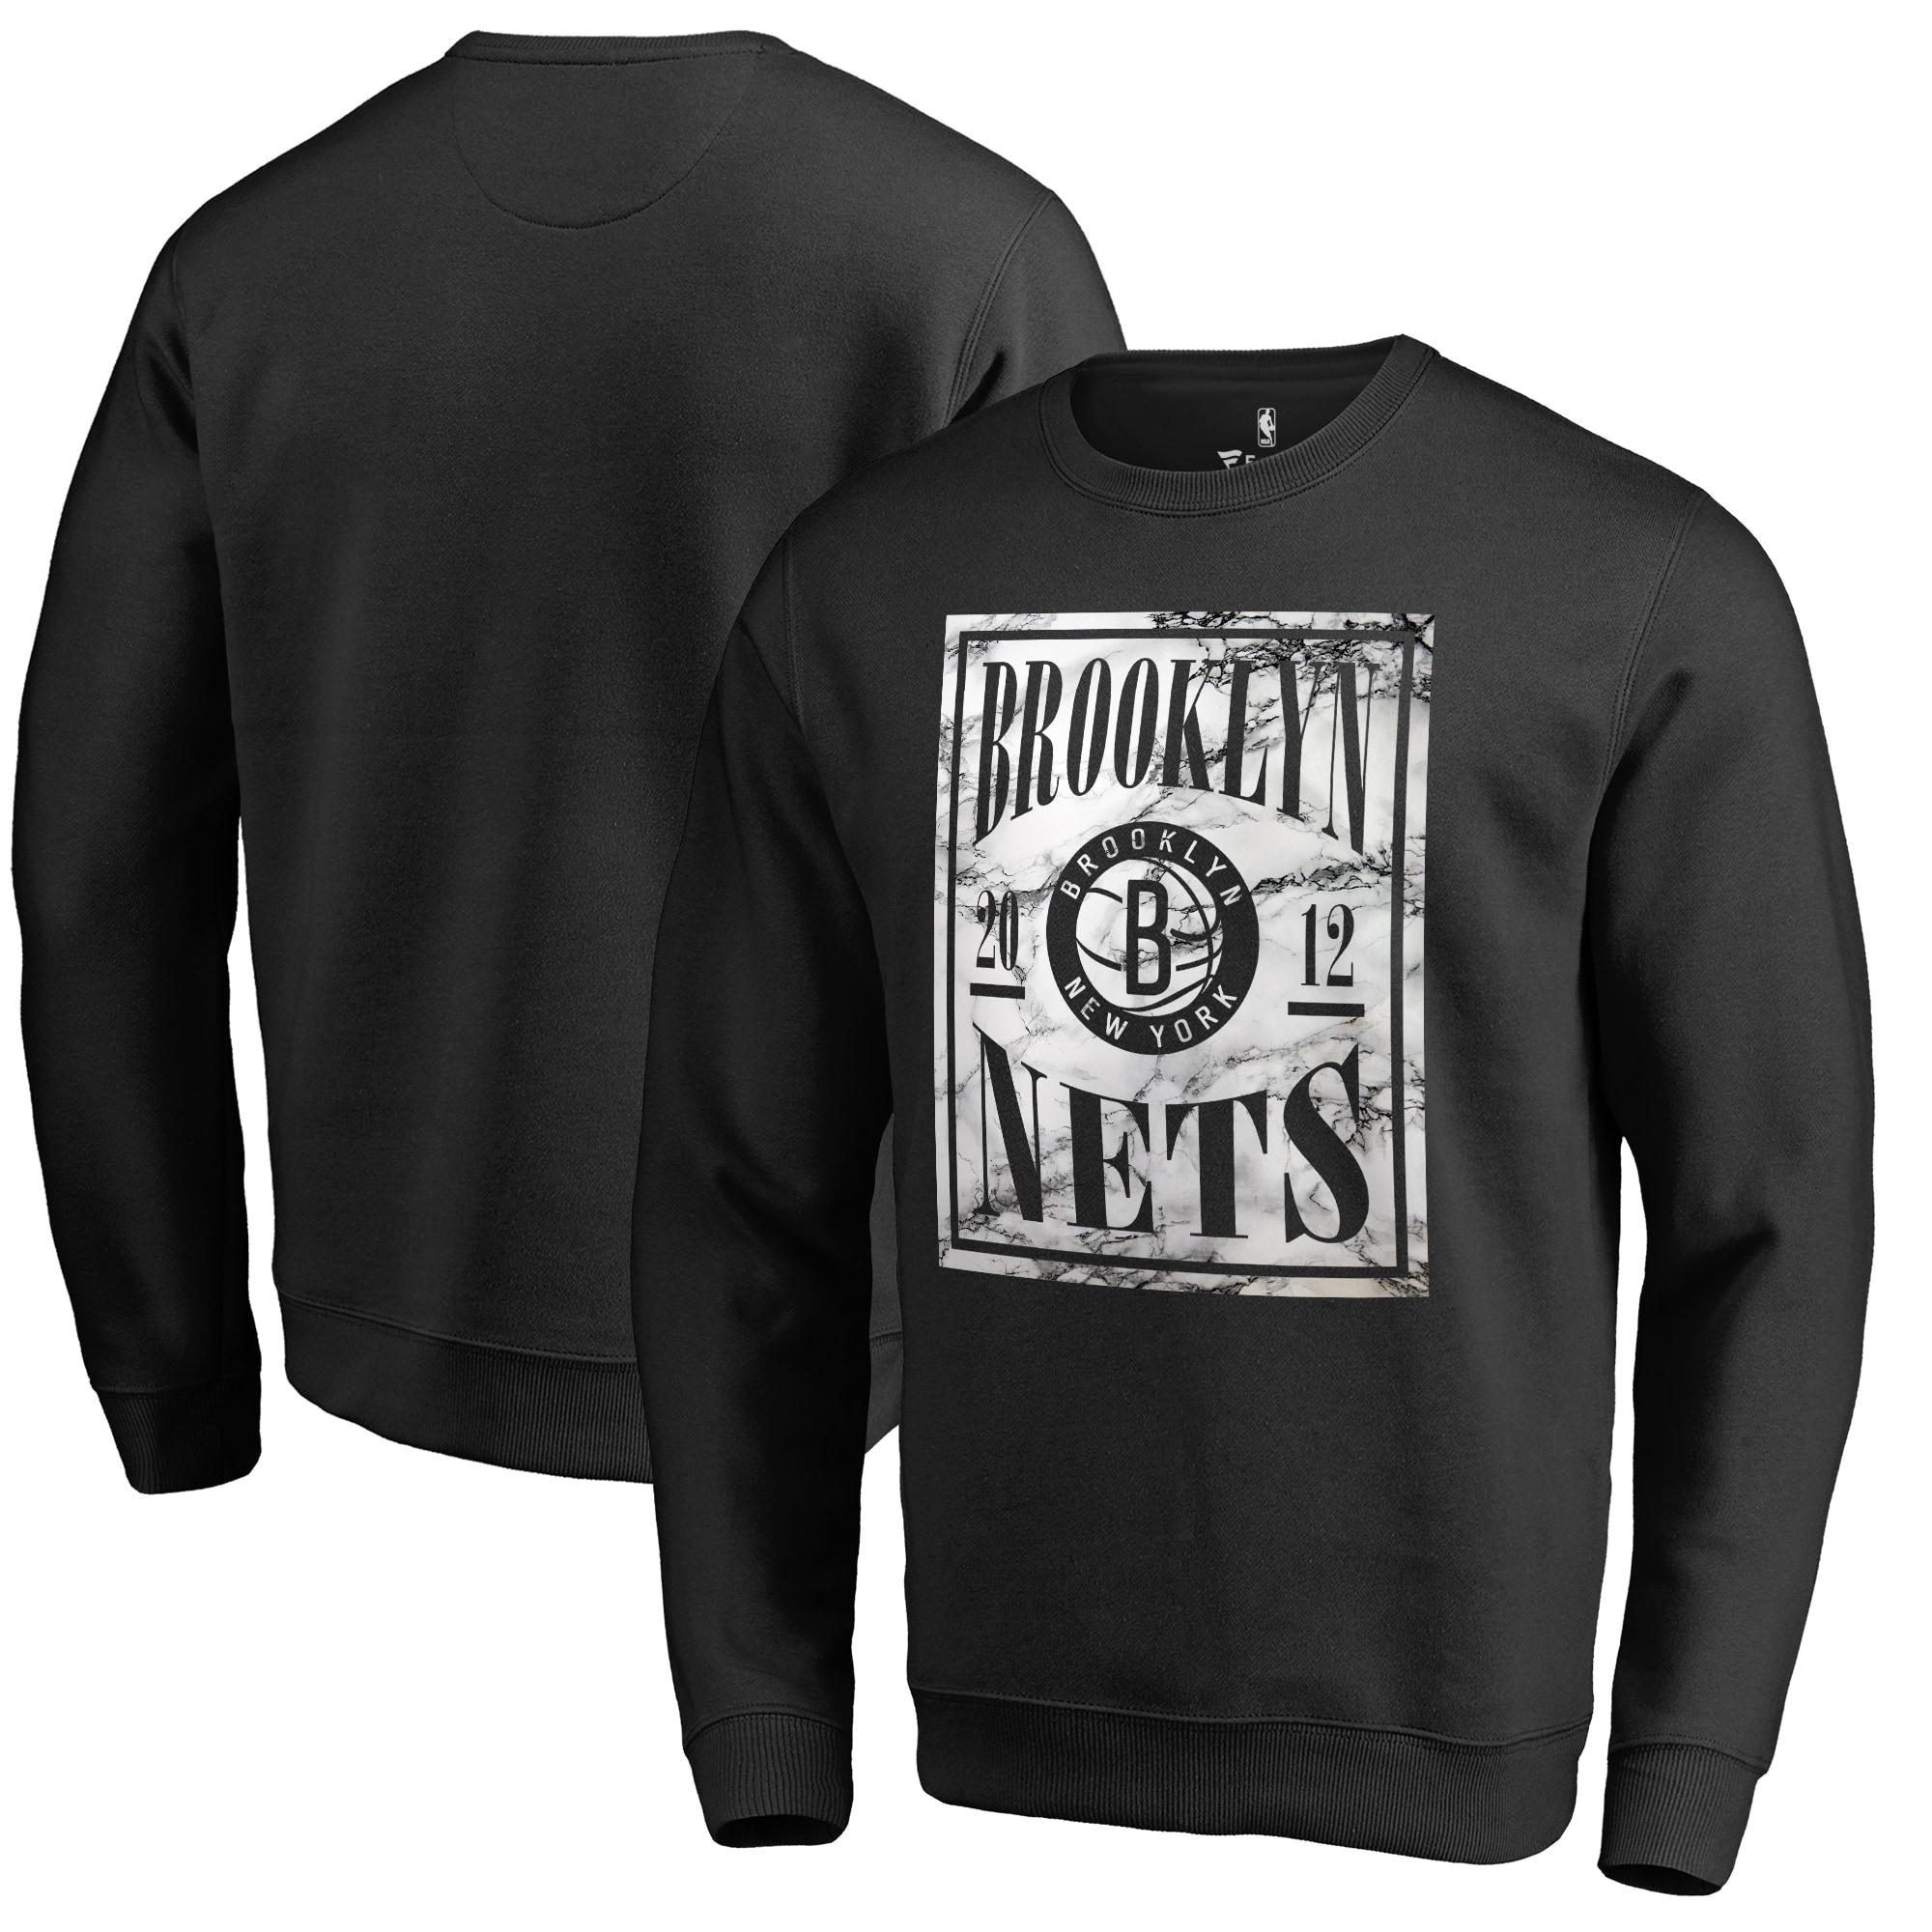 Brooklyn Nets Fanatics Branded Court Vision Crew Sweatshirt - Black